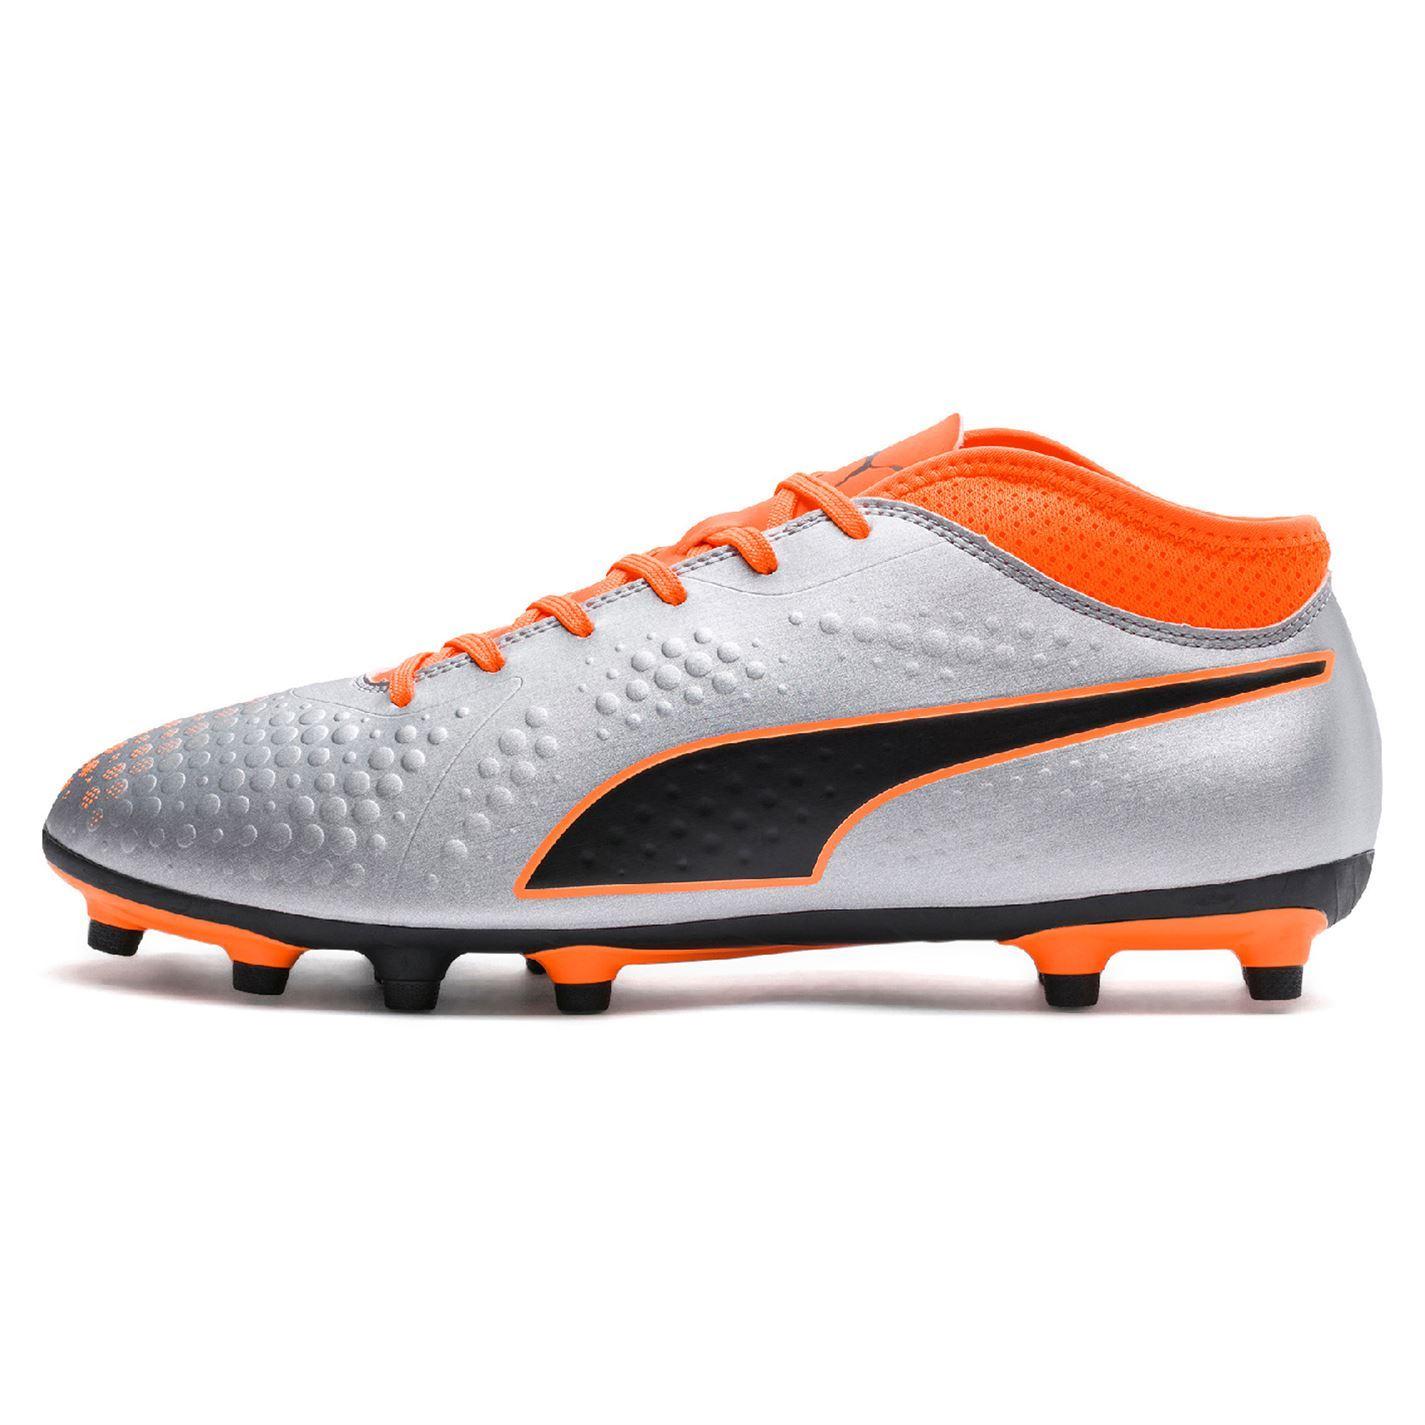 miniature 10 - Puma 4 FG Firm Ground Chaussures De Football Homme Football Chaussures Crampons